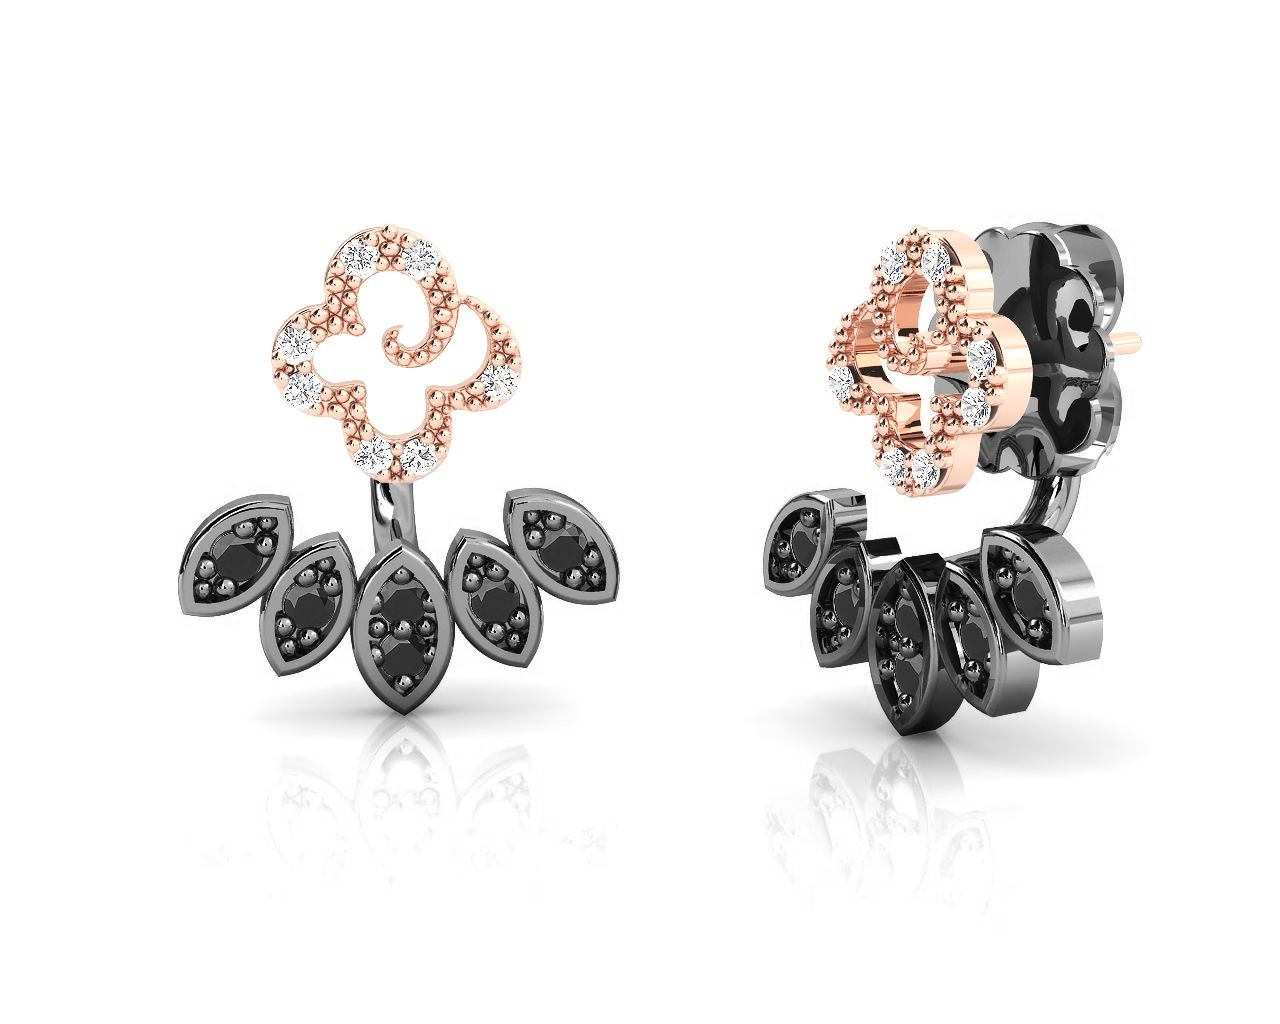 2cb43c01b High Fashion Jewelry | Fashion 2 | Jewelry, Earrings, Rose gold earrings